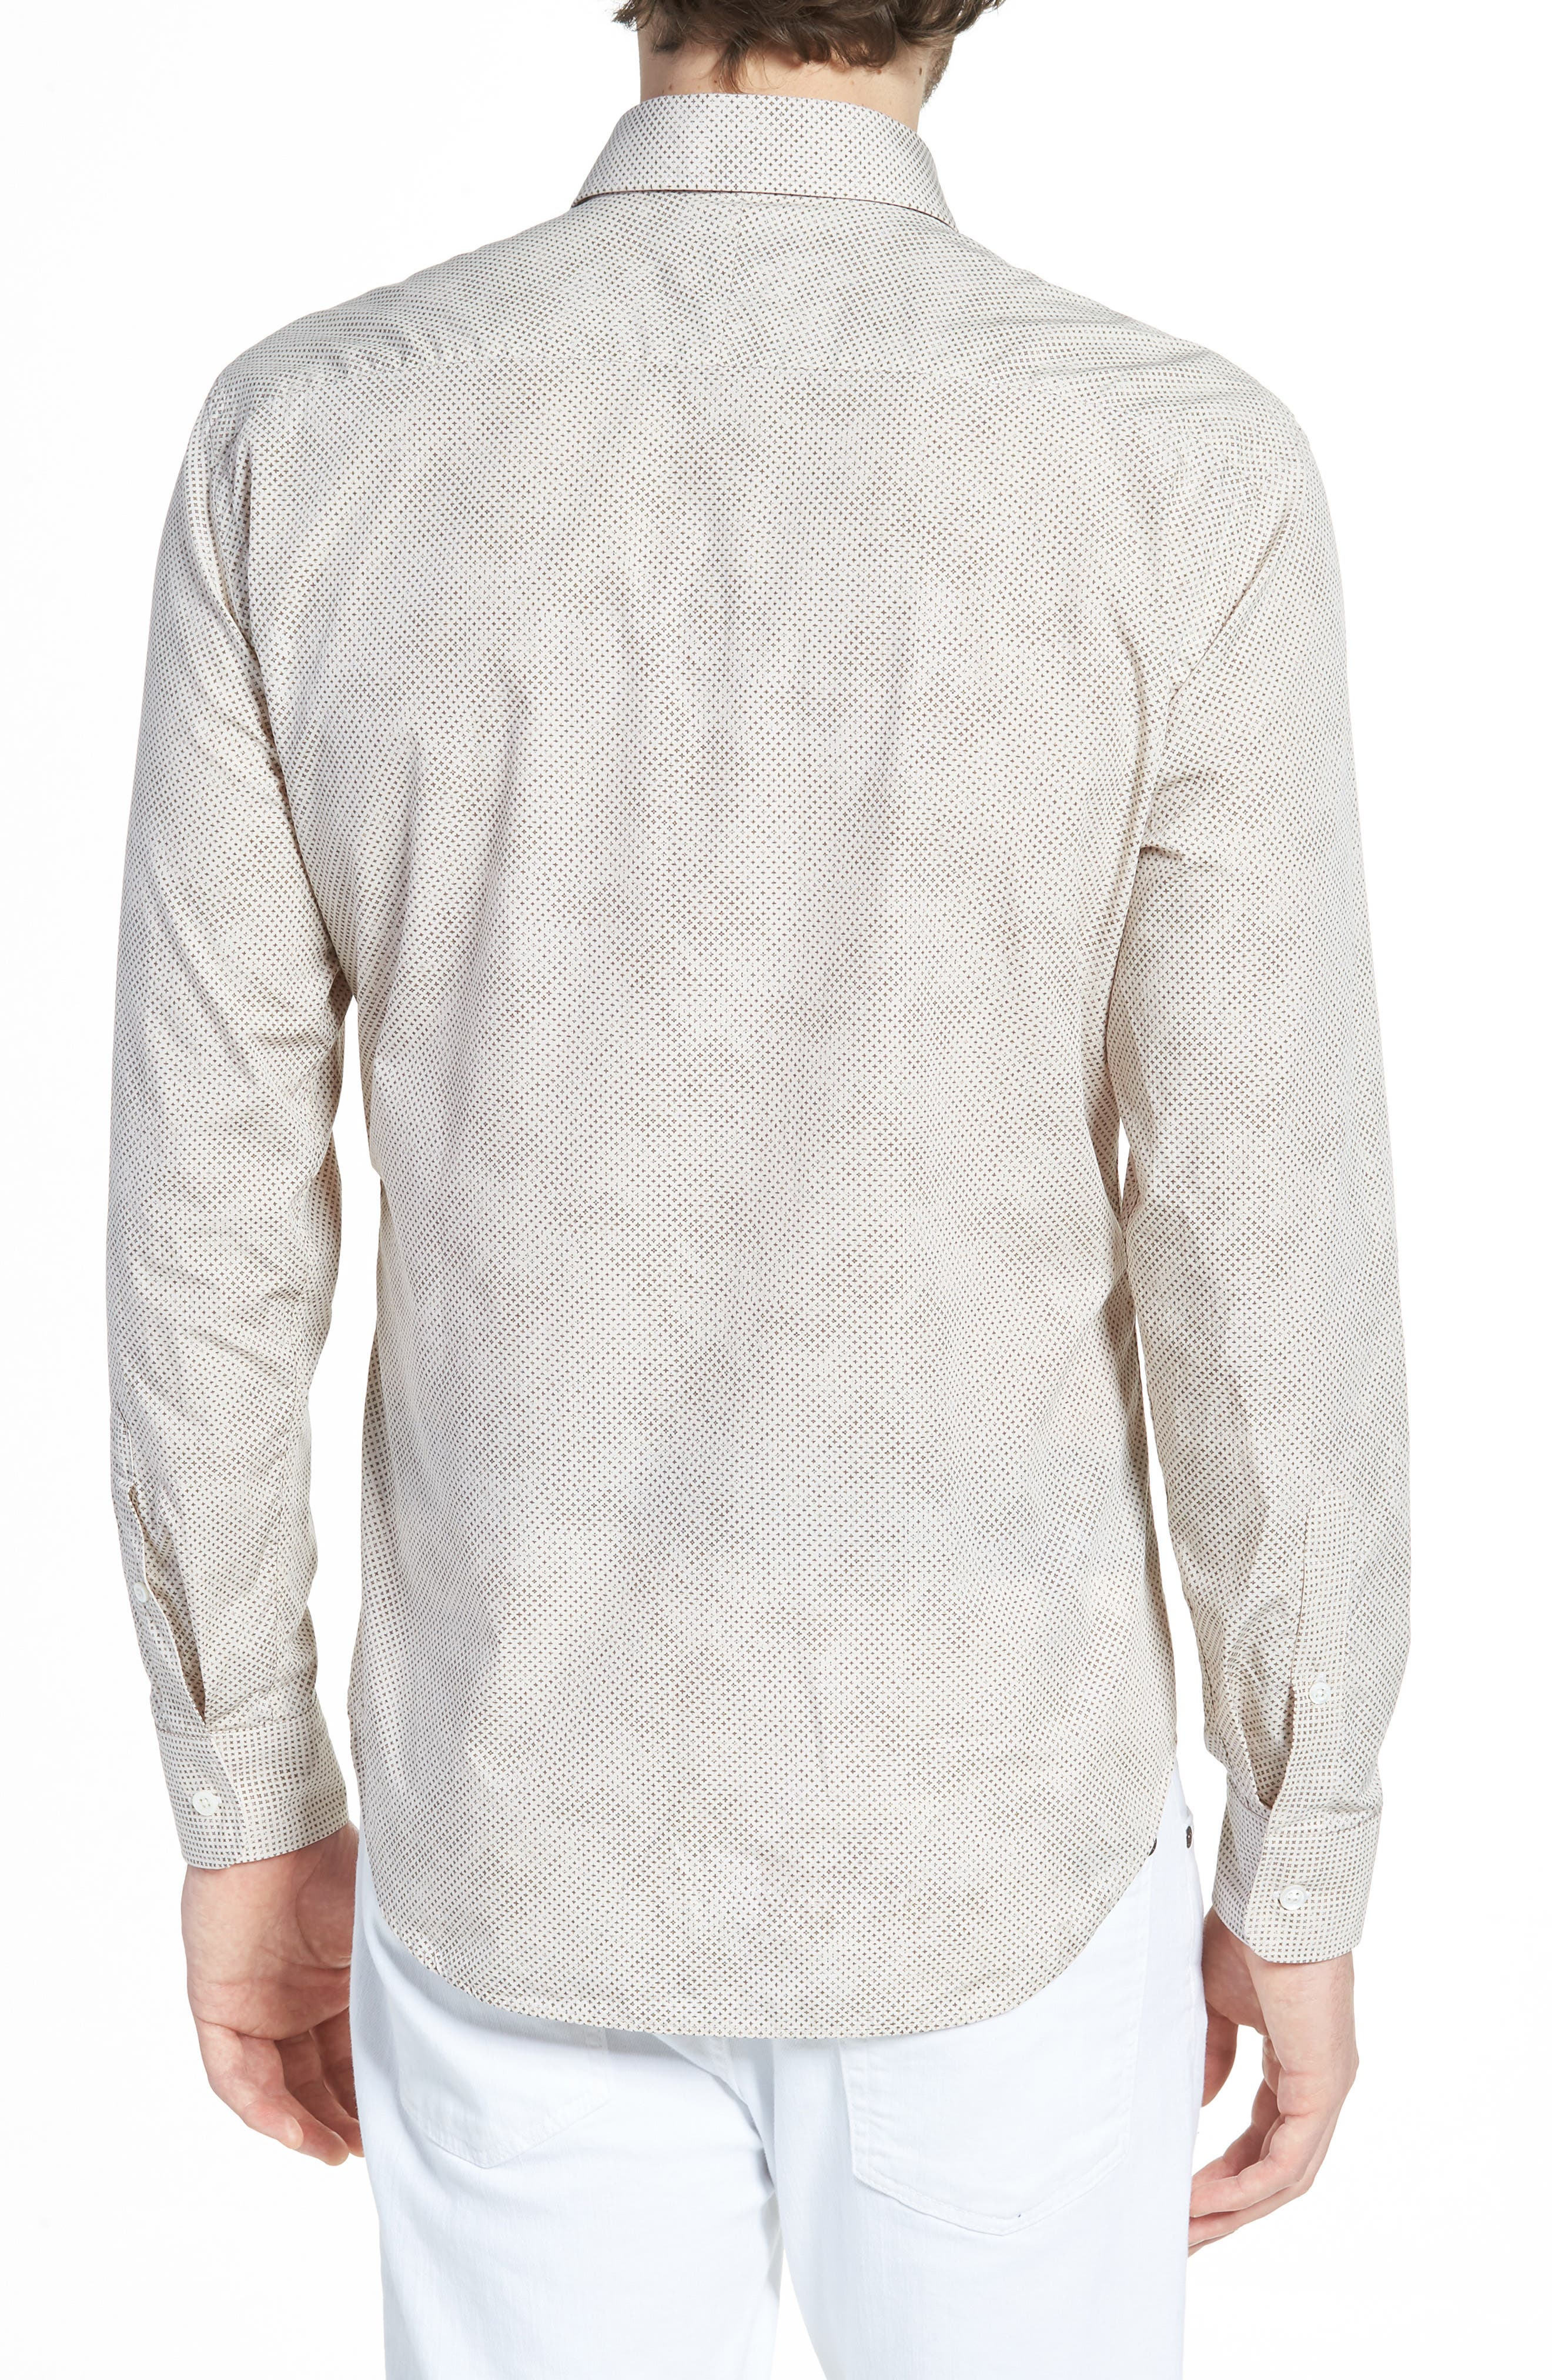 Kirby Sport Shirt,                             Alternate thumbnail 3, color,                             Natural/ Brown